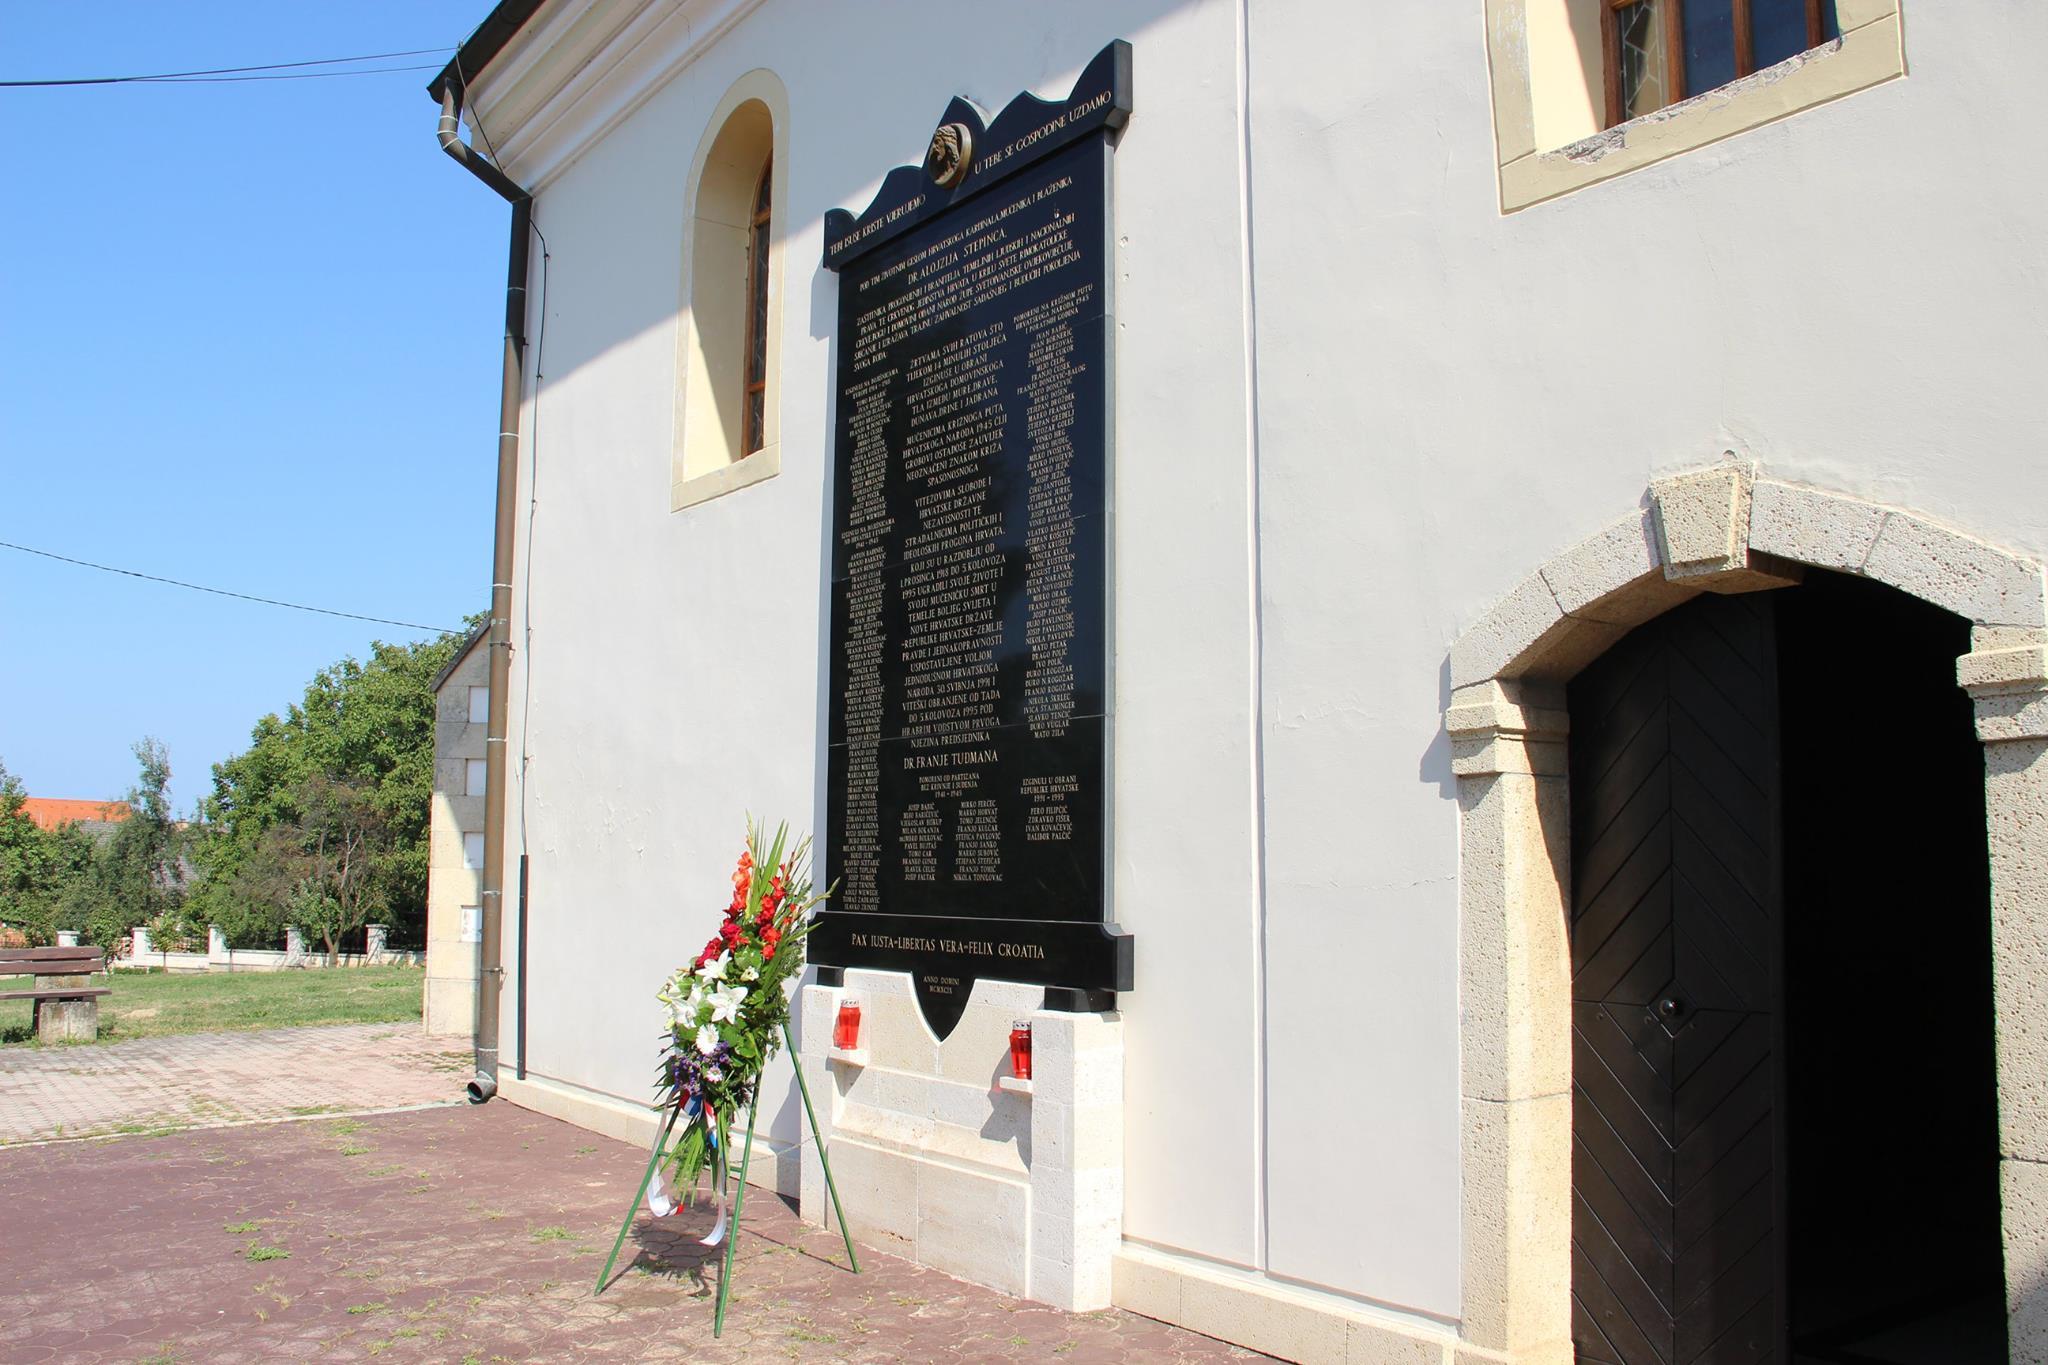 Polaganje vijenaca na Dan pobjede i domovinske zahvalnosti te Dan hrvatskih branitelja